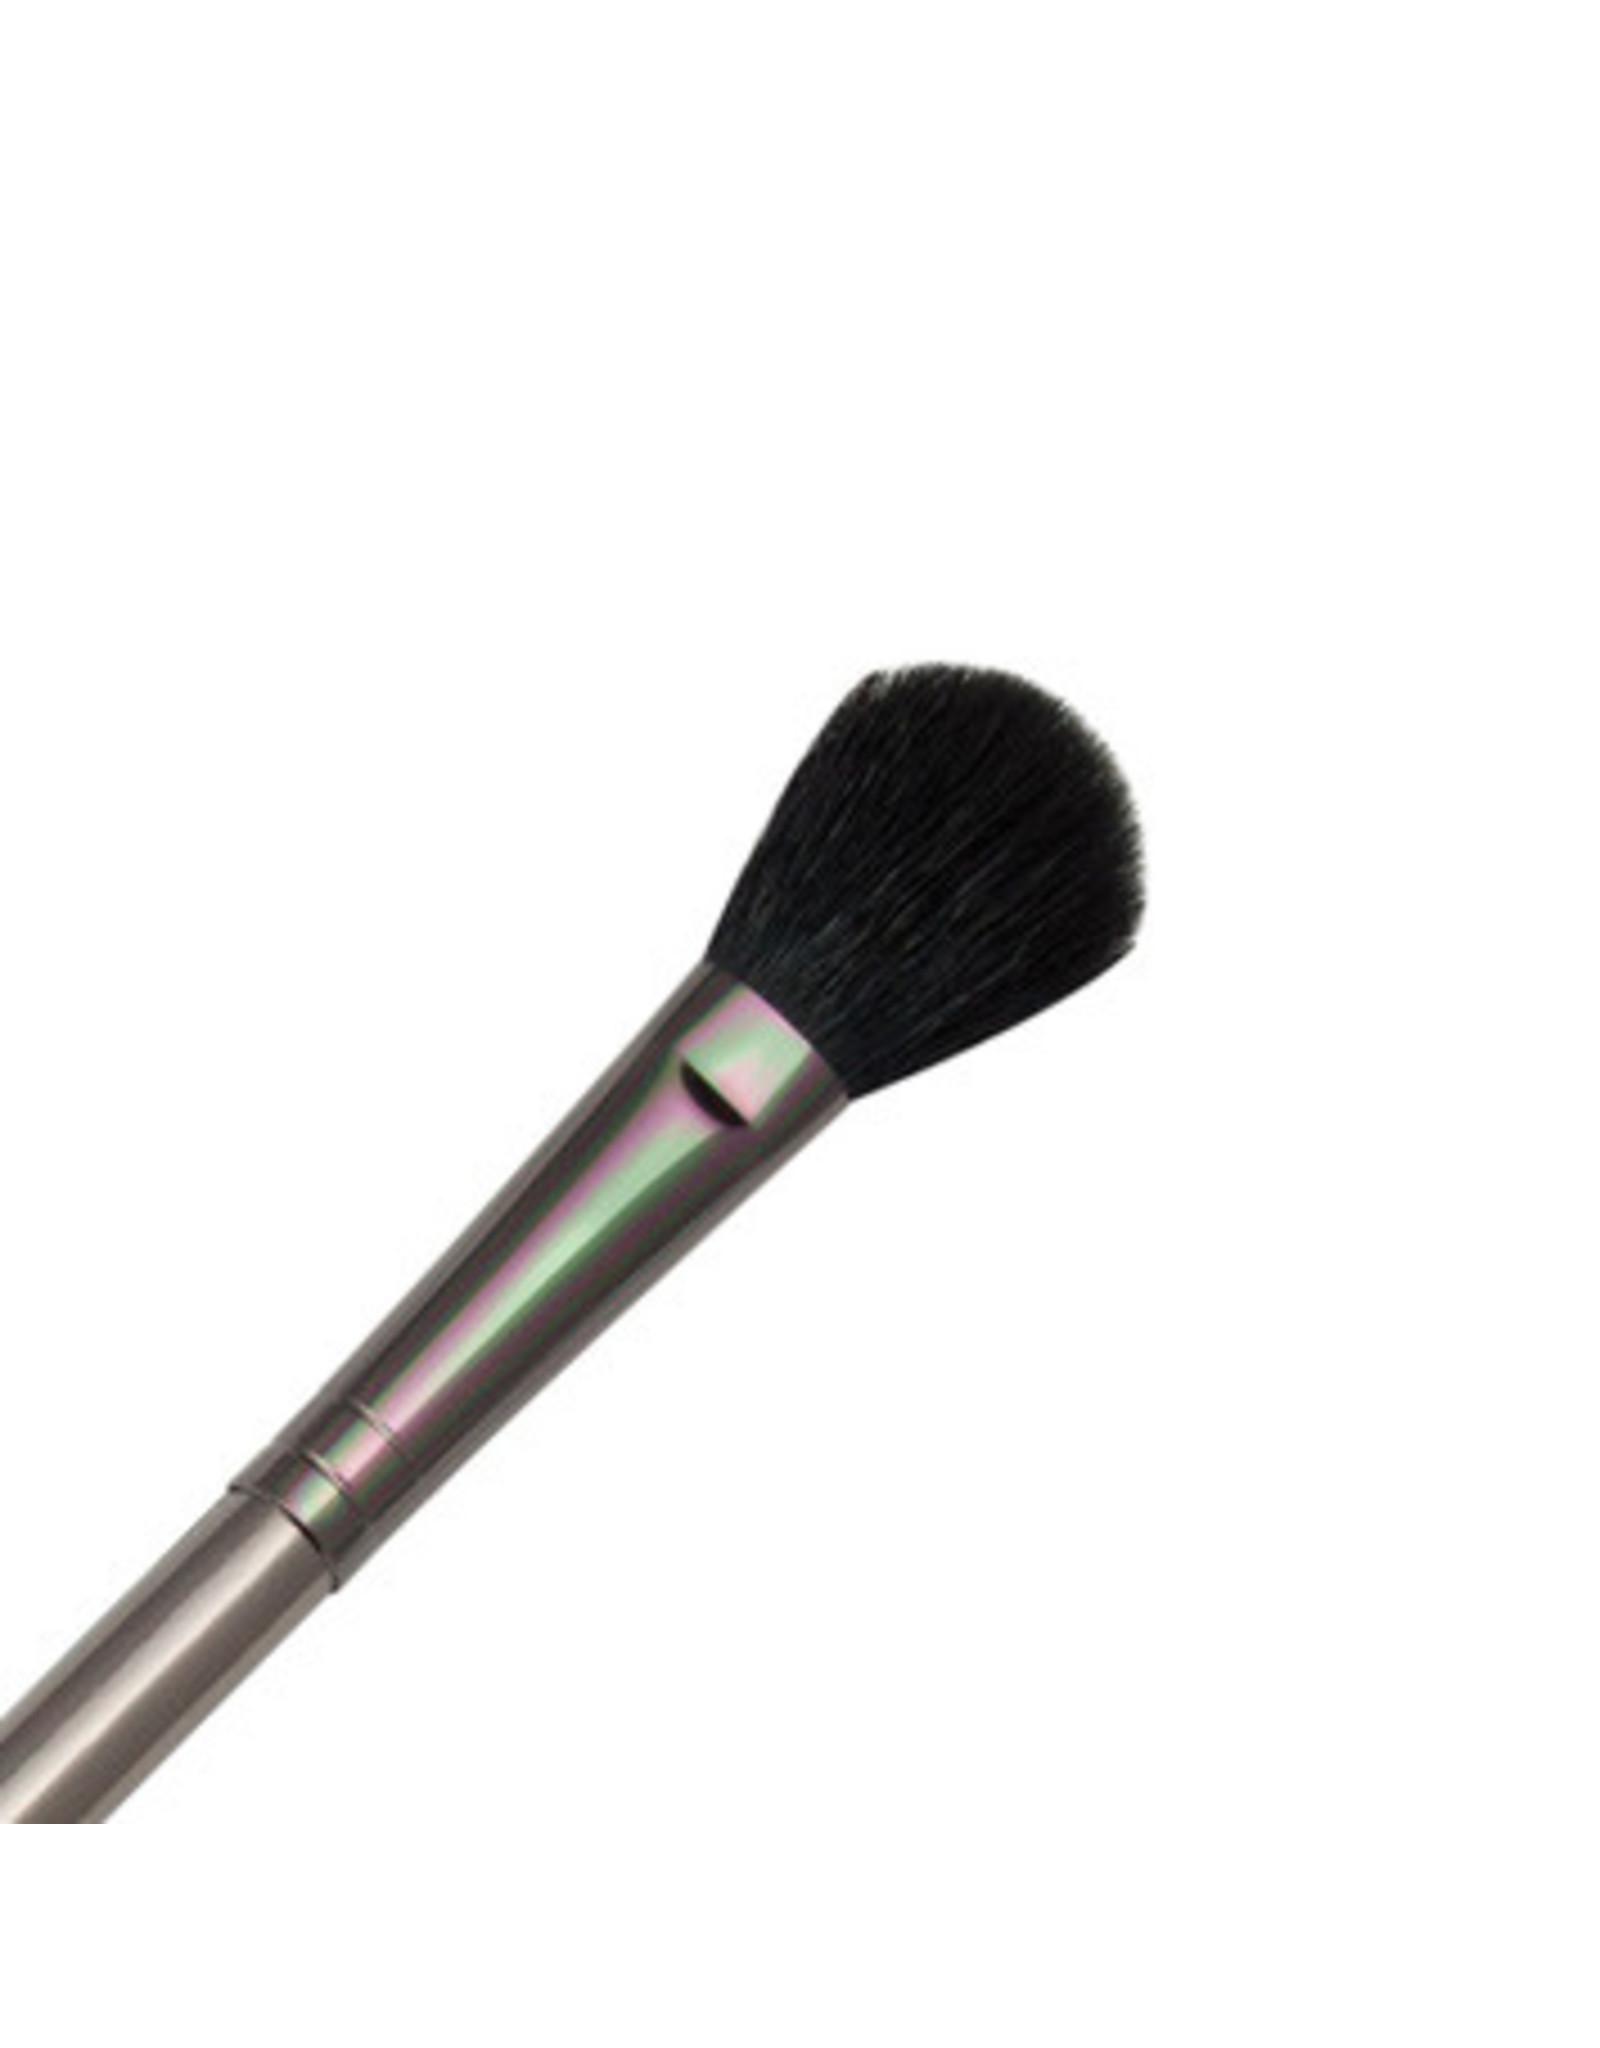 Royal & Langnickel Zen 83 Series Black Goat Mop 12mm brush